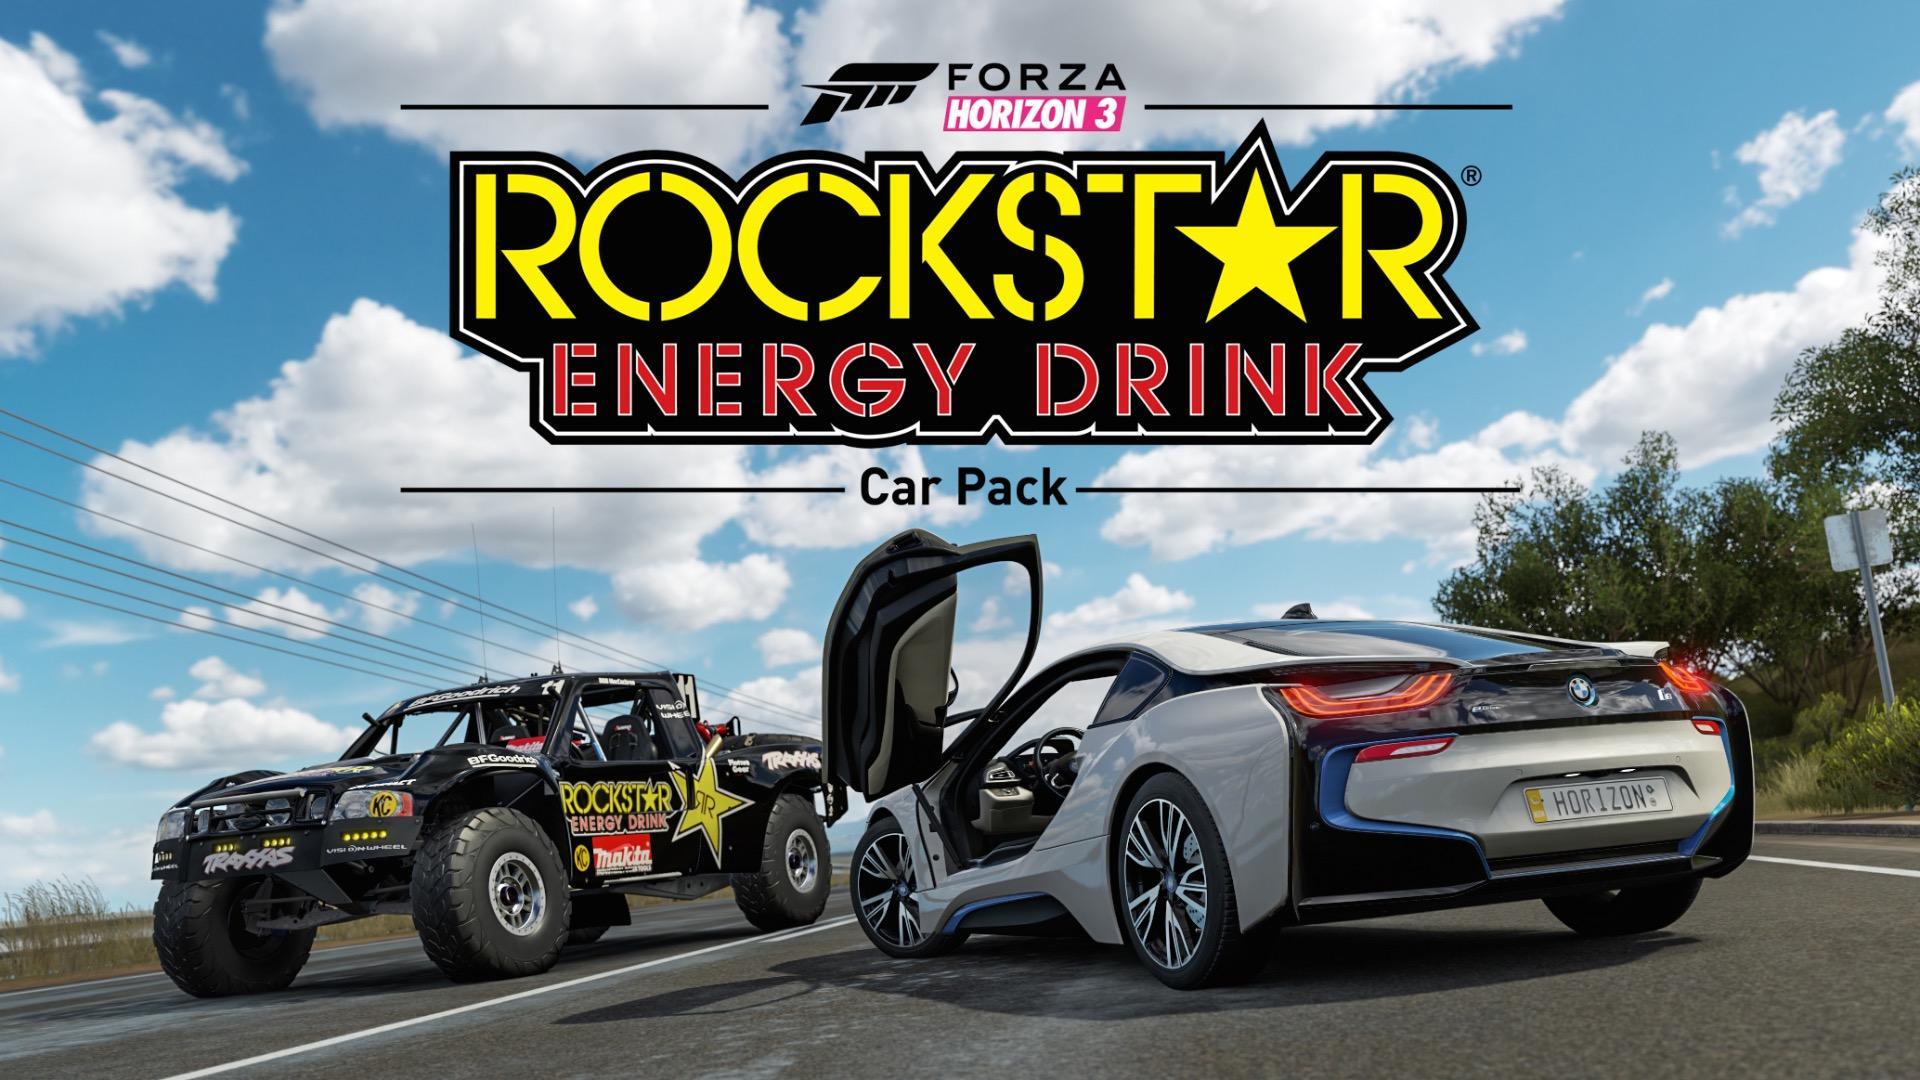 Forza Horizon 3 Rockstar Car Pack Out Now Xbox e Xbox 360 News